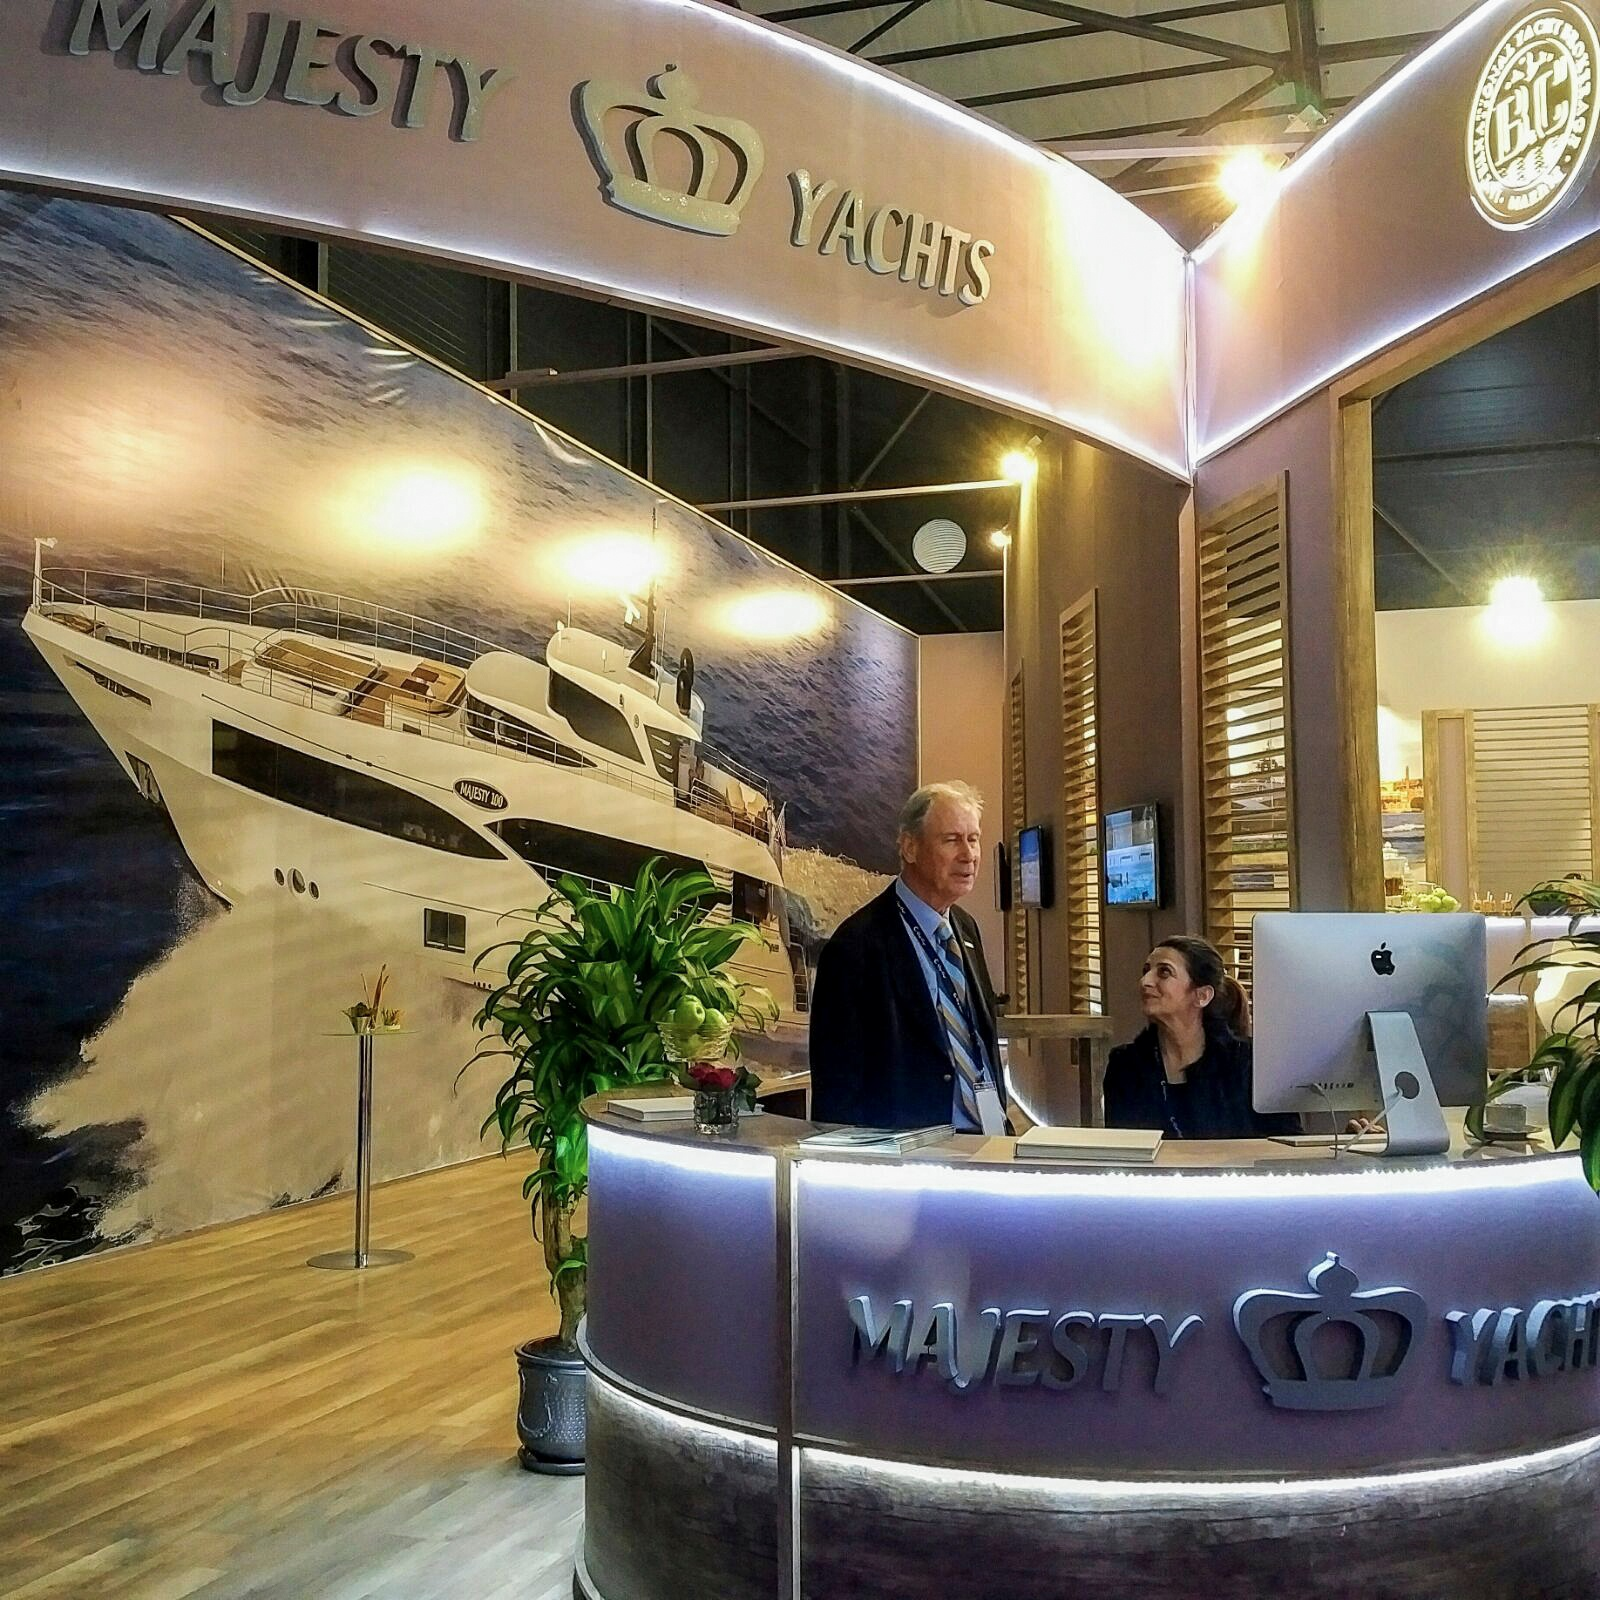 Gulf Craft at Tuzla Boat Show 2018 (19).jpg